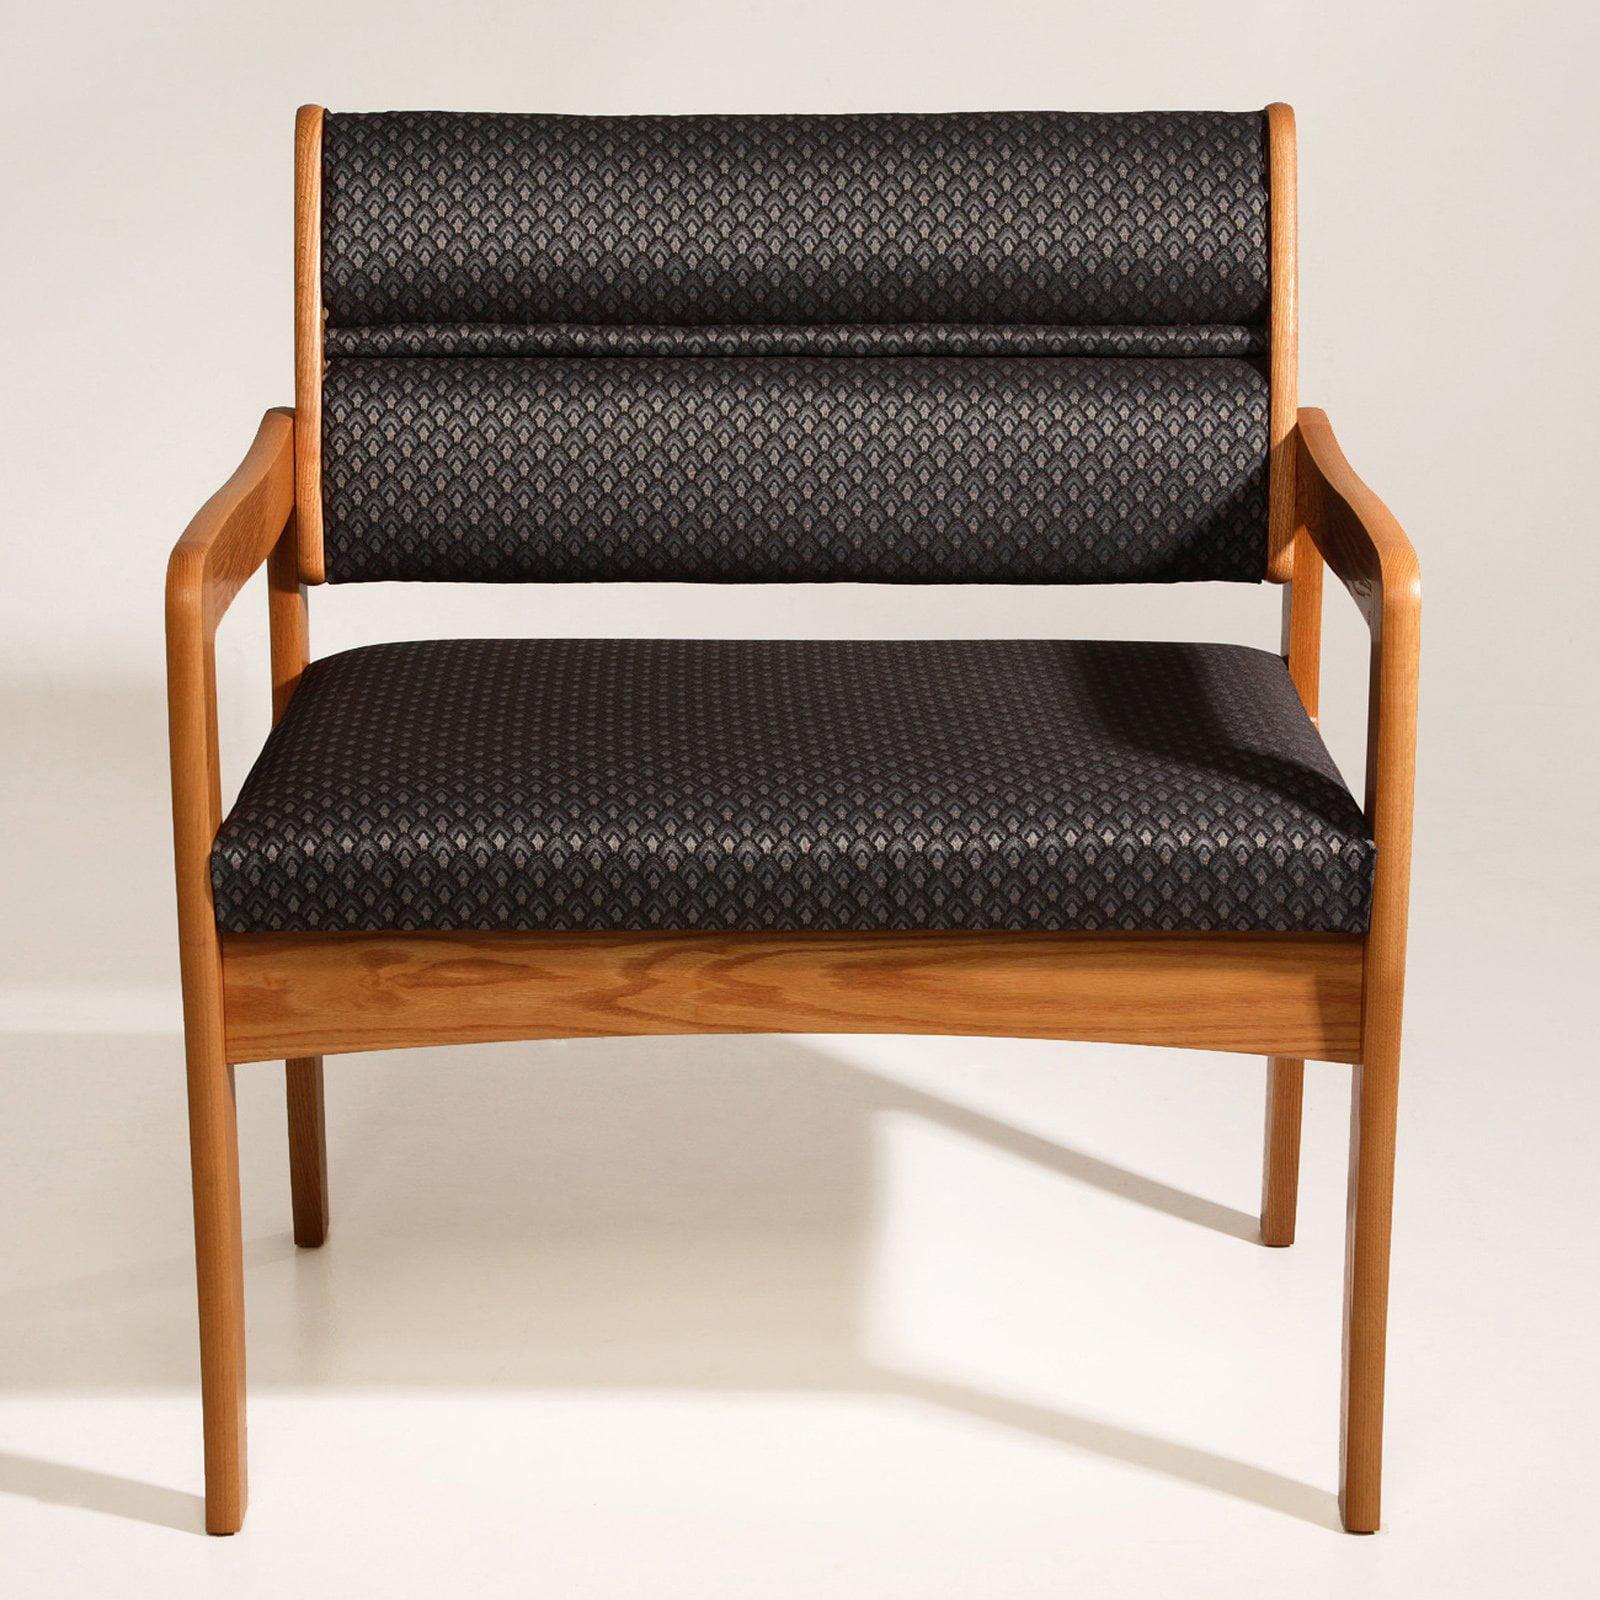 Wooden Mallet DWBA3-1 Solid Oak Bariatric Guest Chair